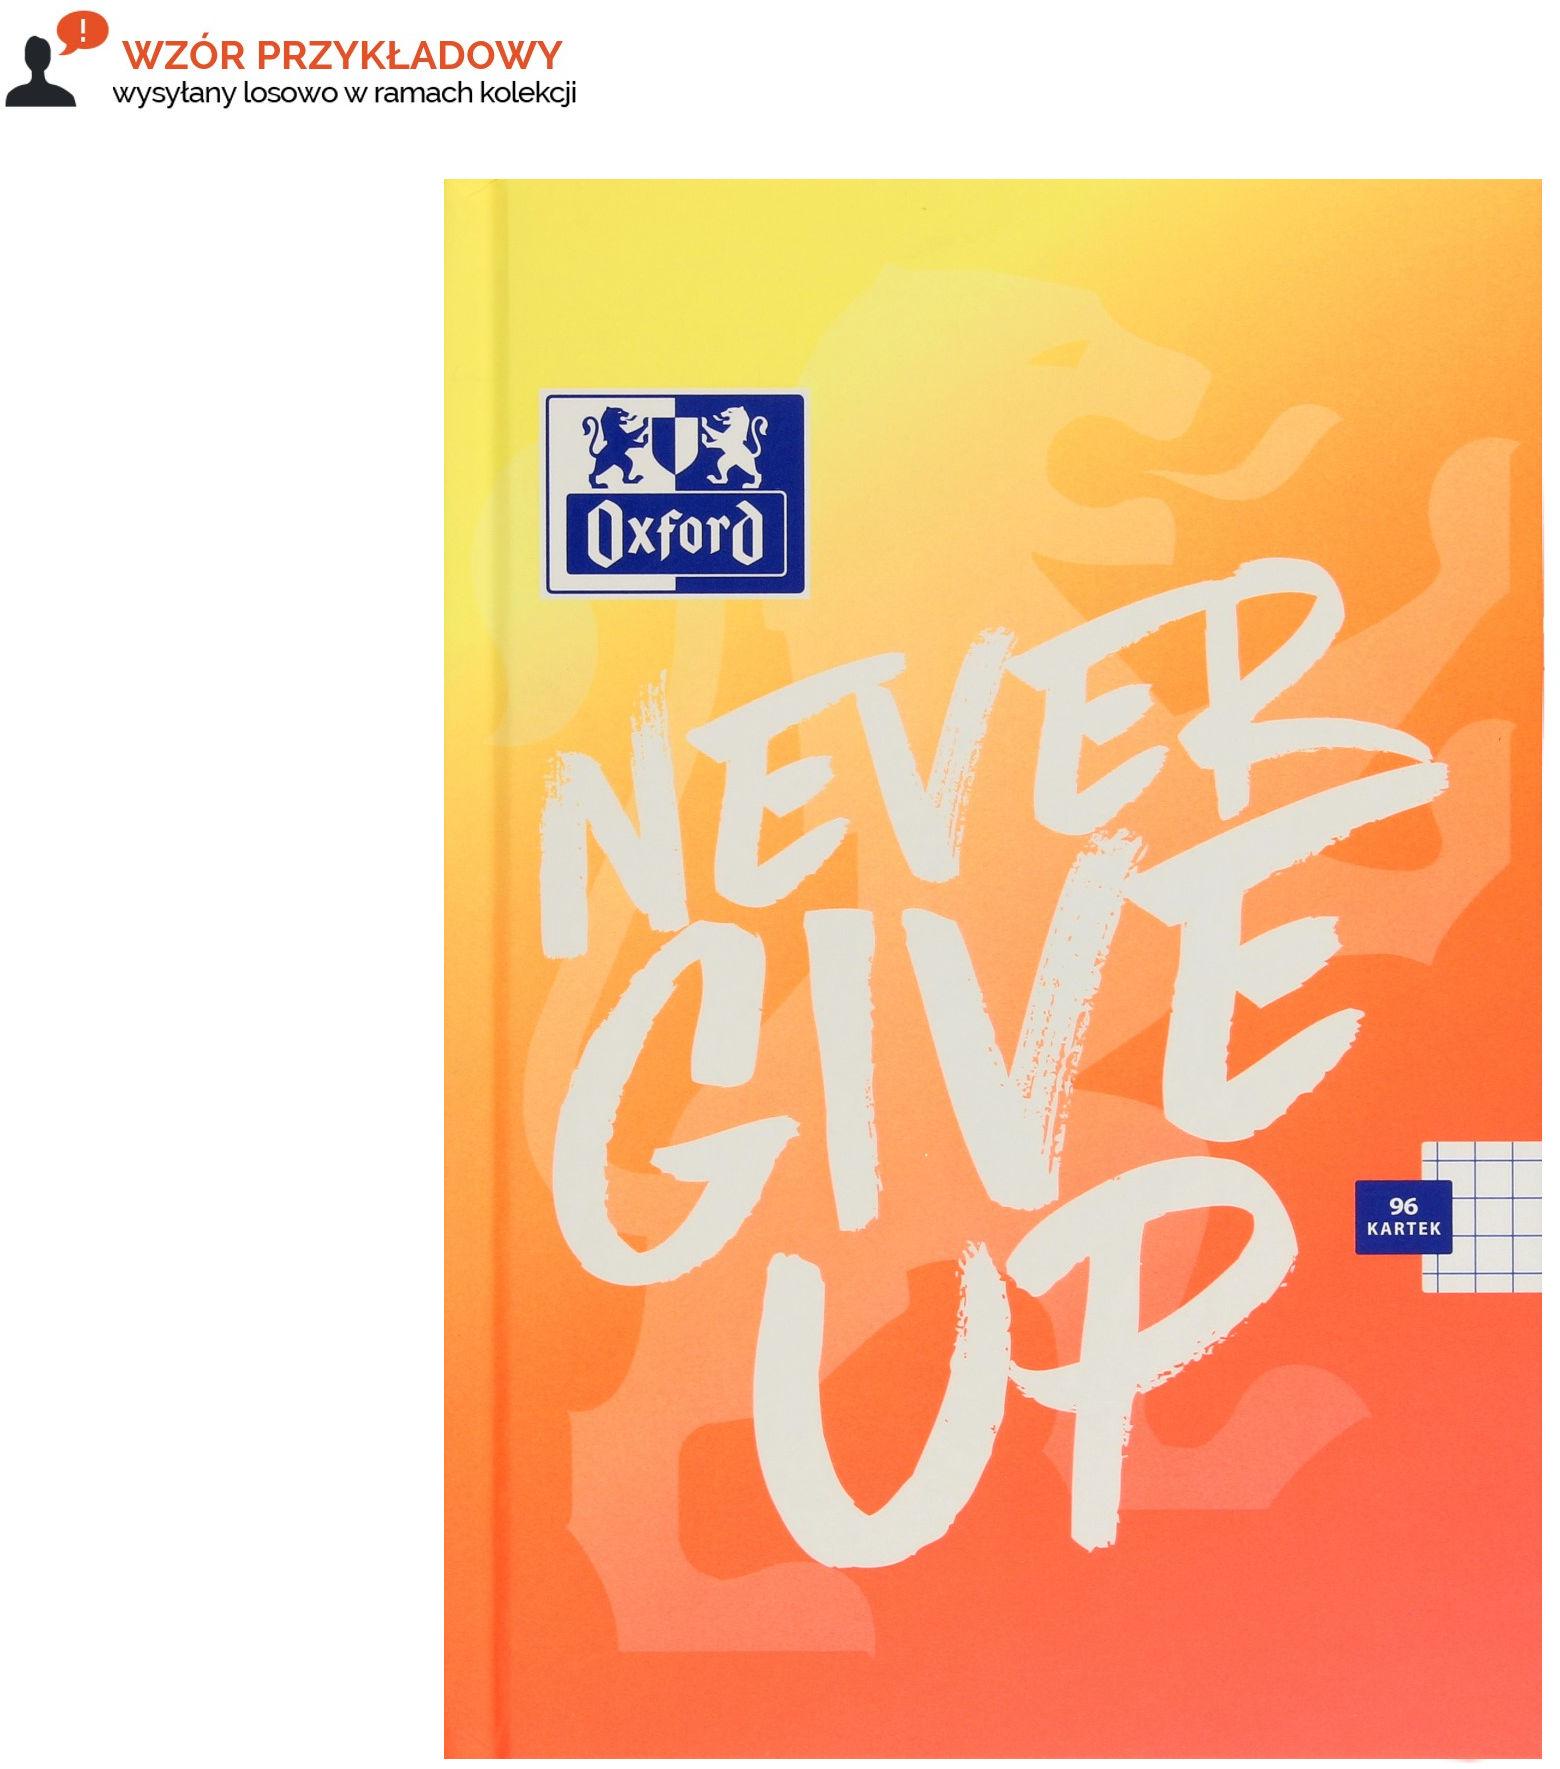 Brulion A5/96 kratka Never Give Up Oxford 400114799